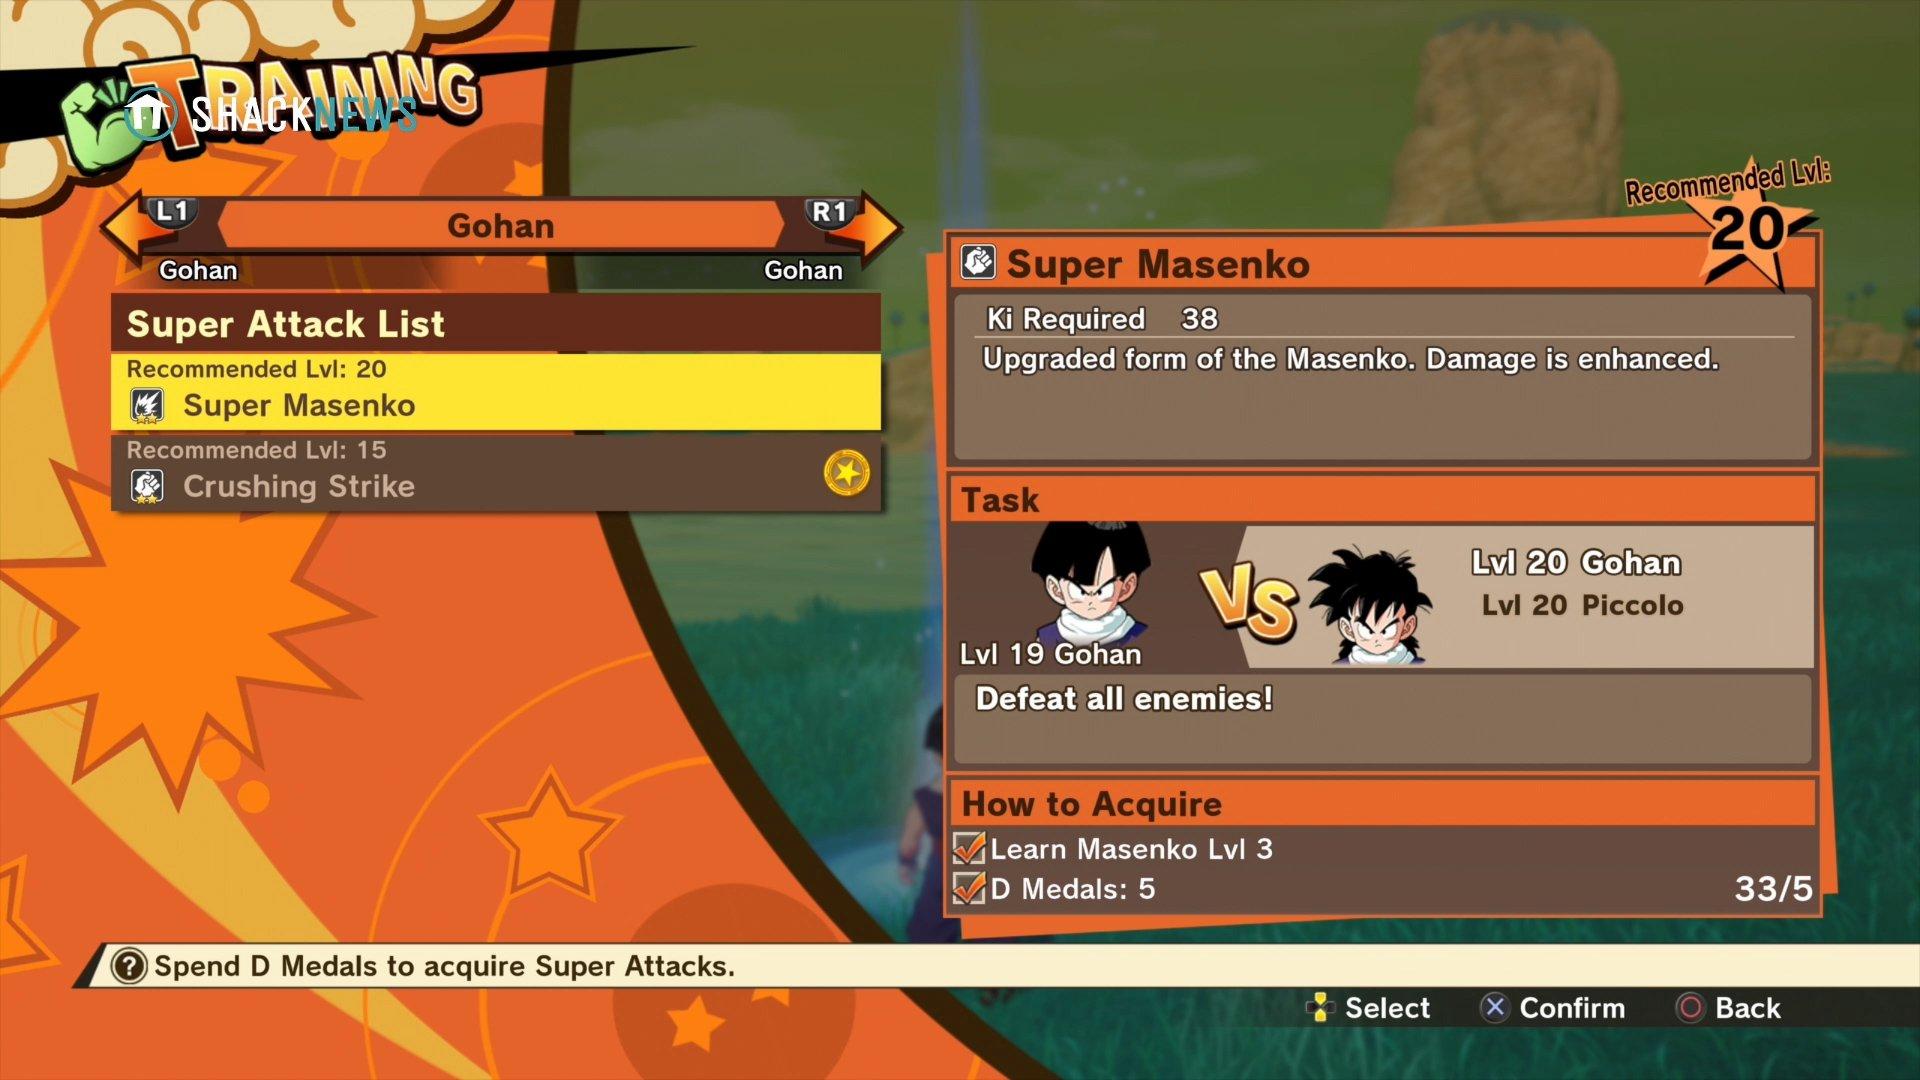 Dragon Ball Z: Kakarot - Training Grounds Menu